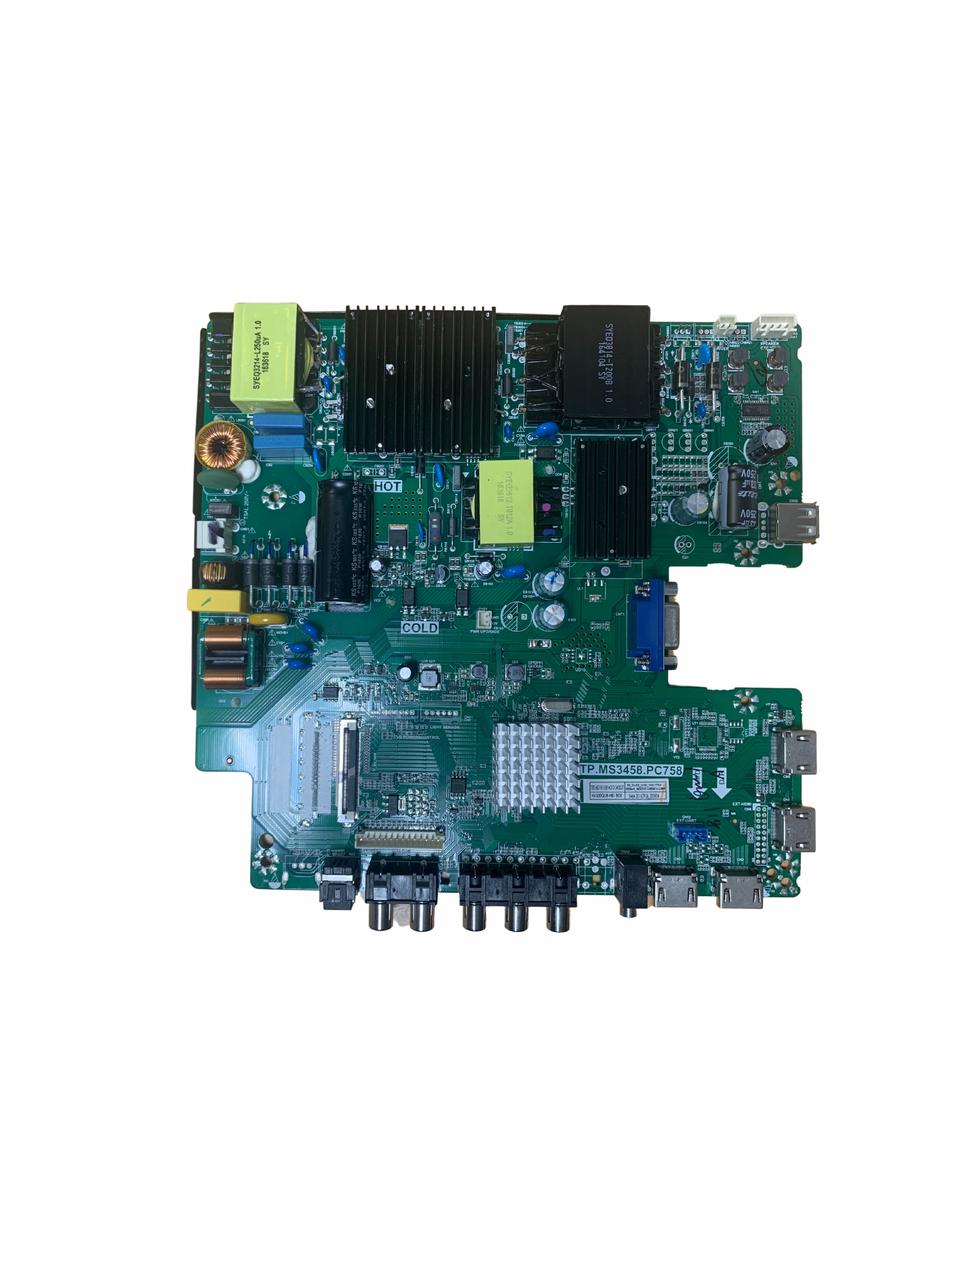 Sceptre U55 PCIV58CE Main board TP.MS3458.PC758 / A16090230